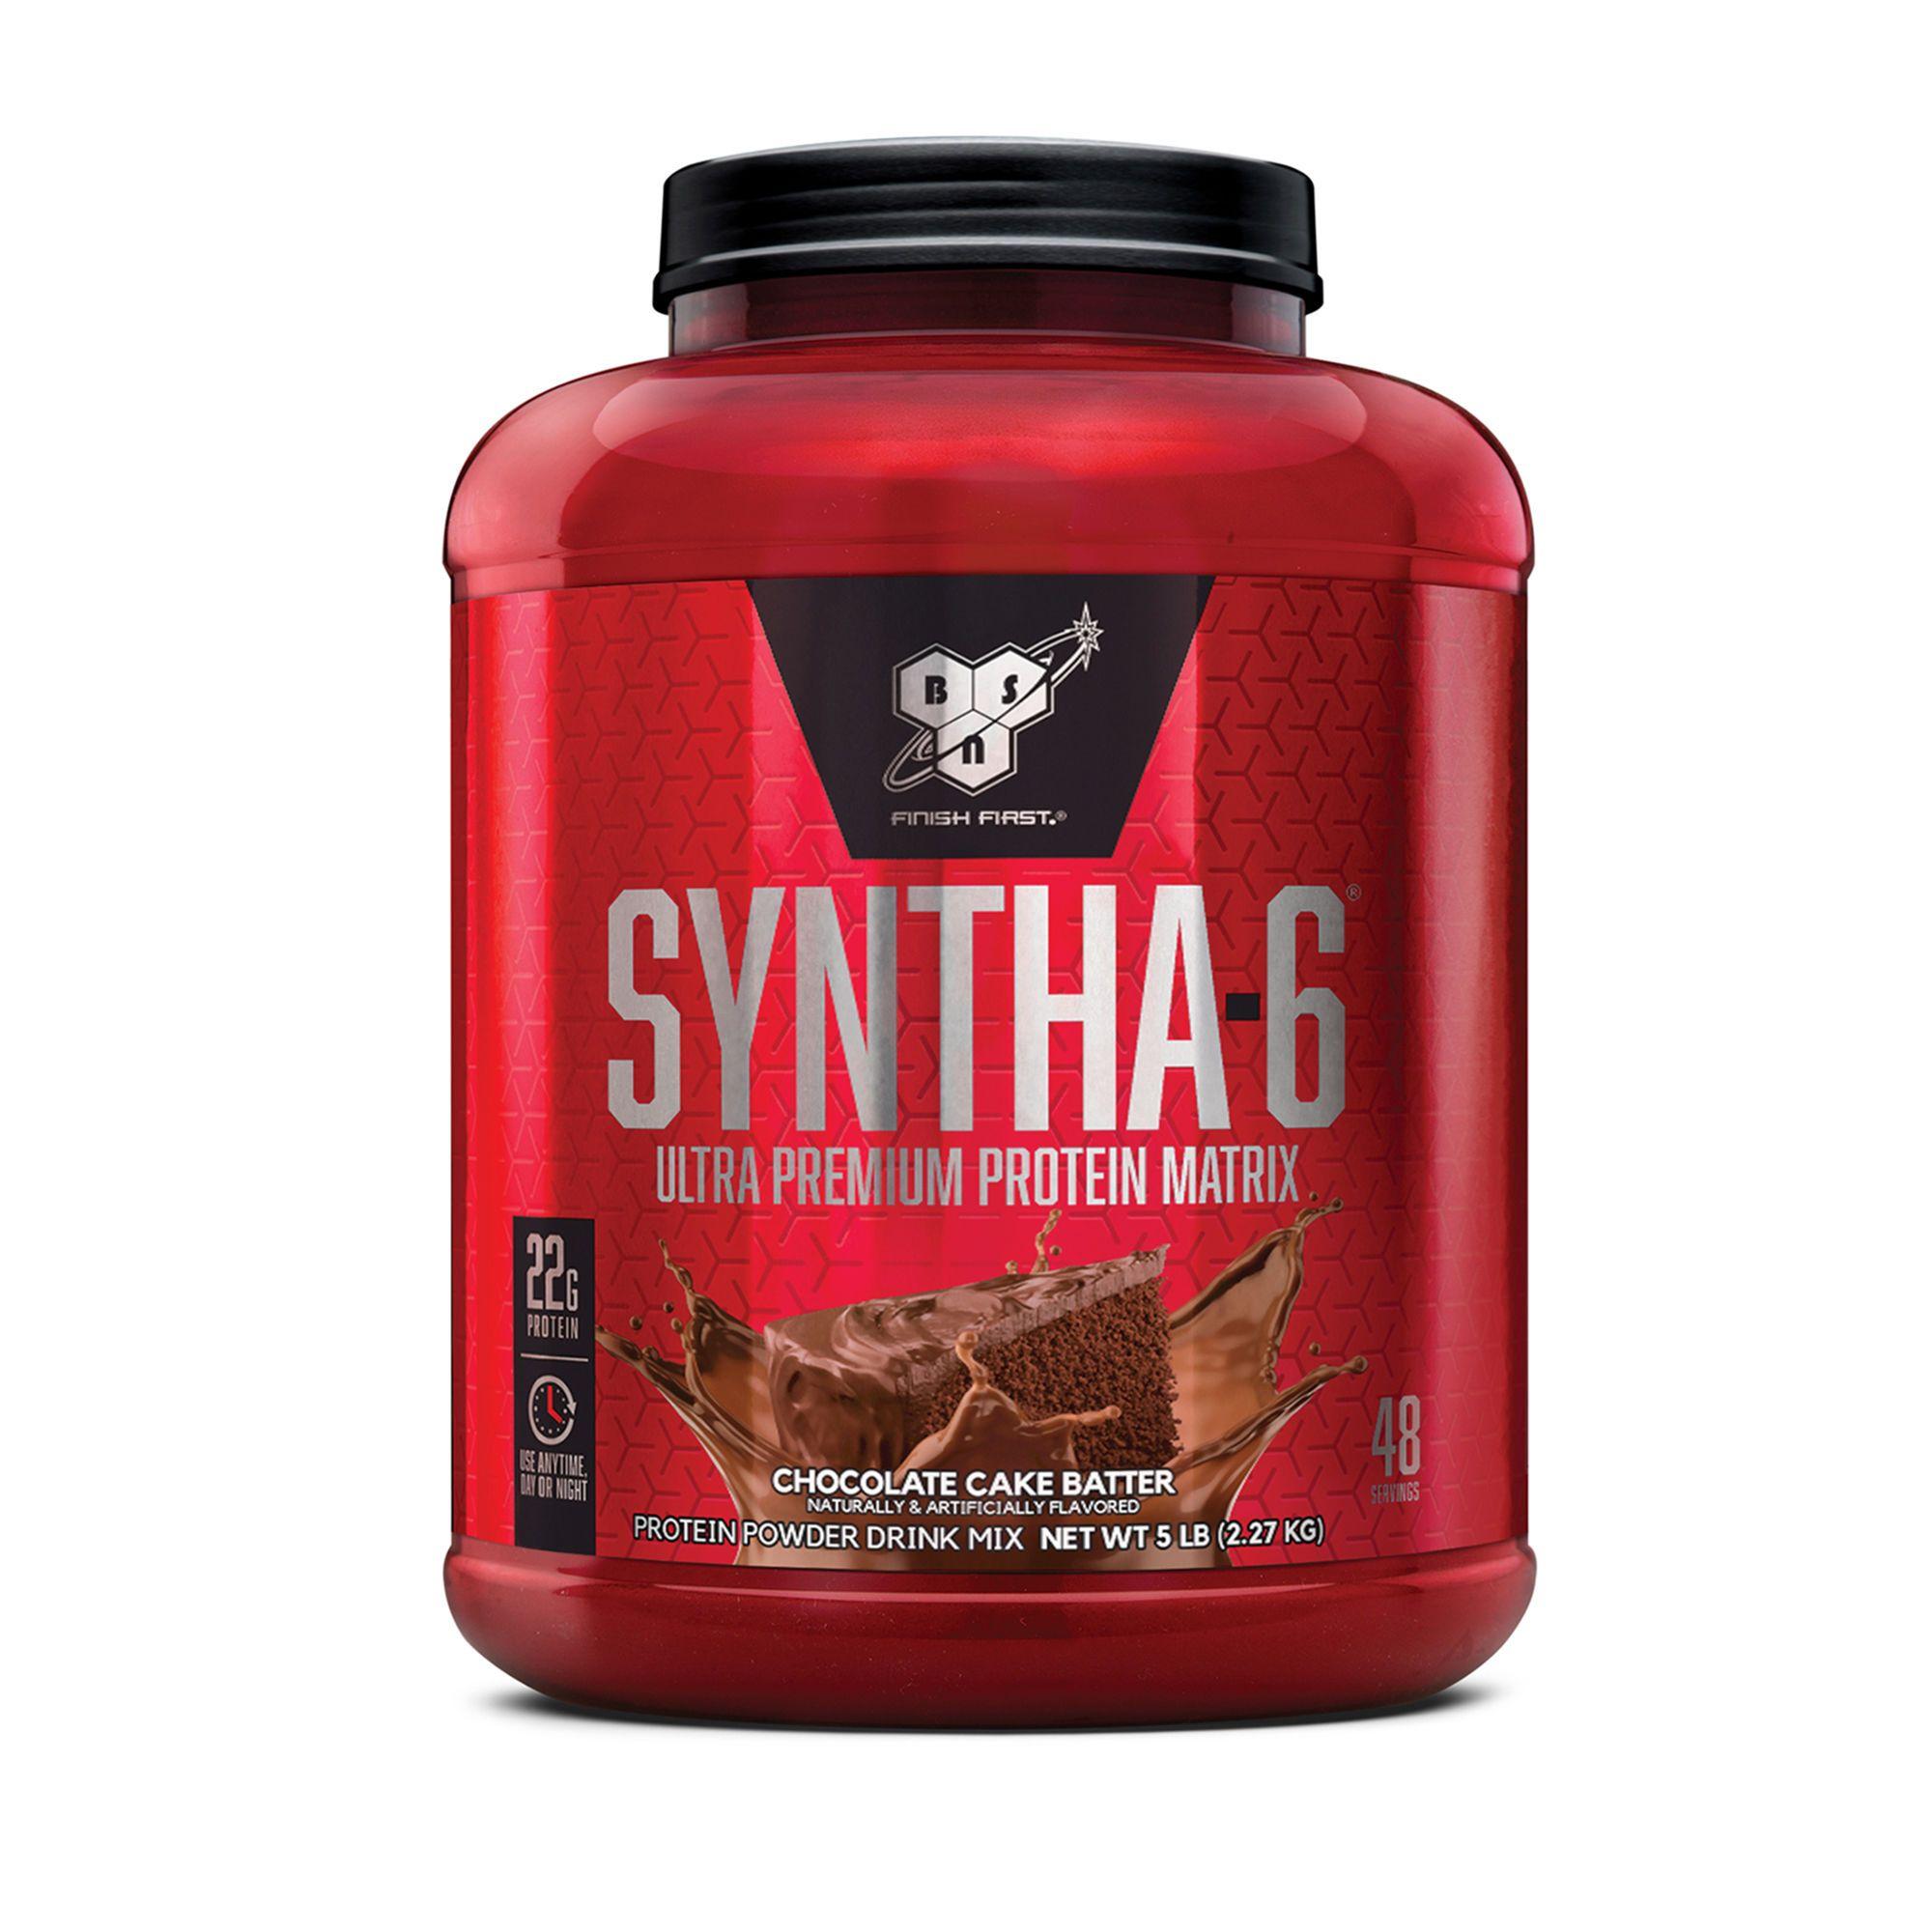 Bsn syntha6 chocolate milkshake milkshake protein